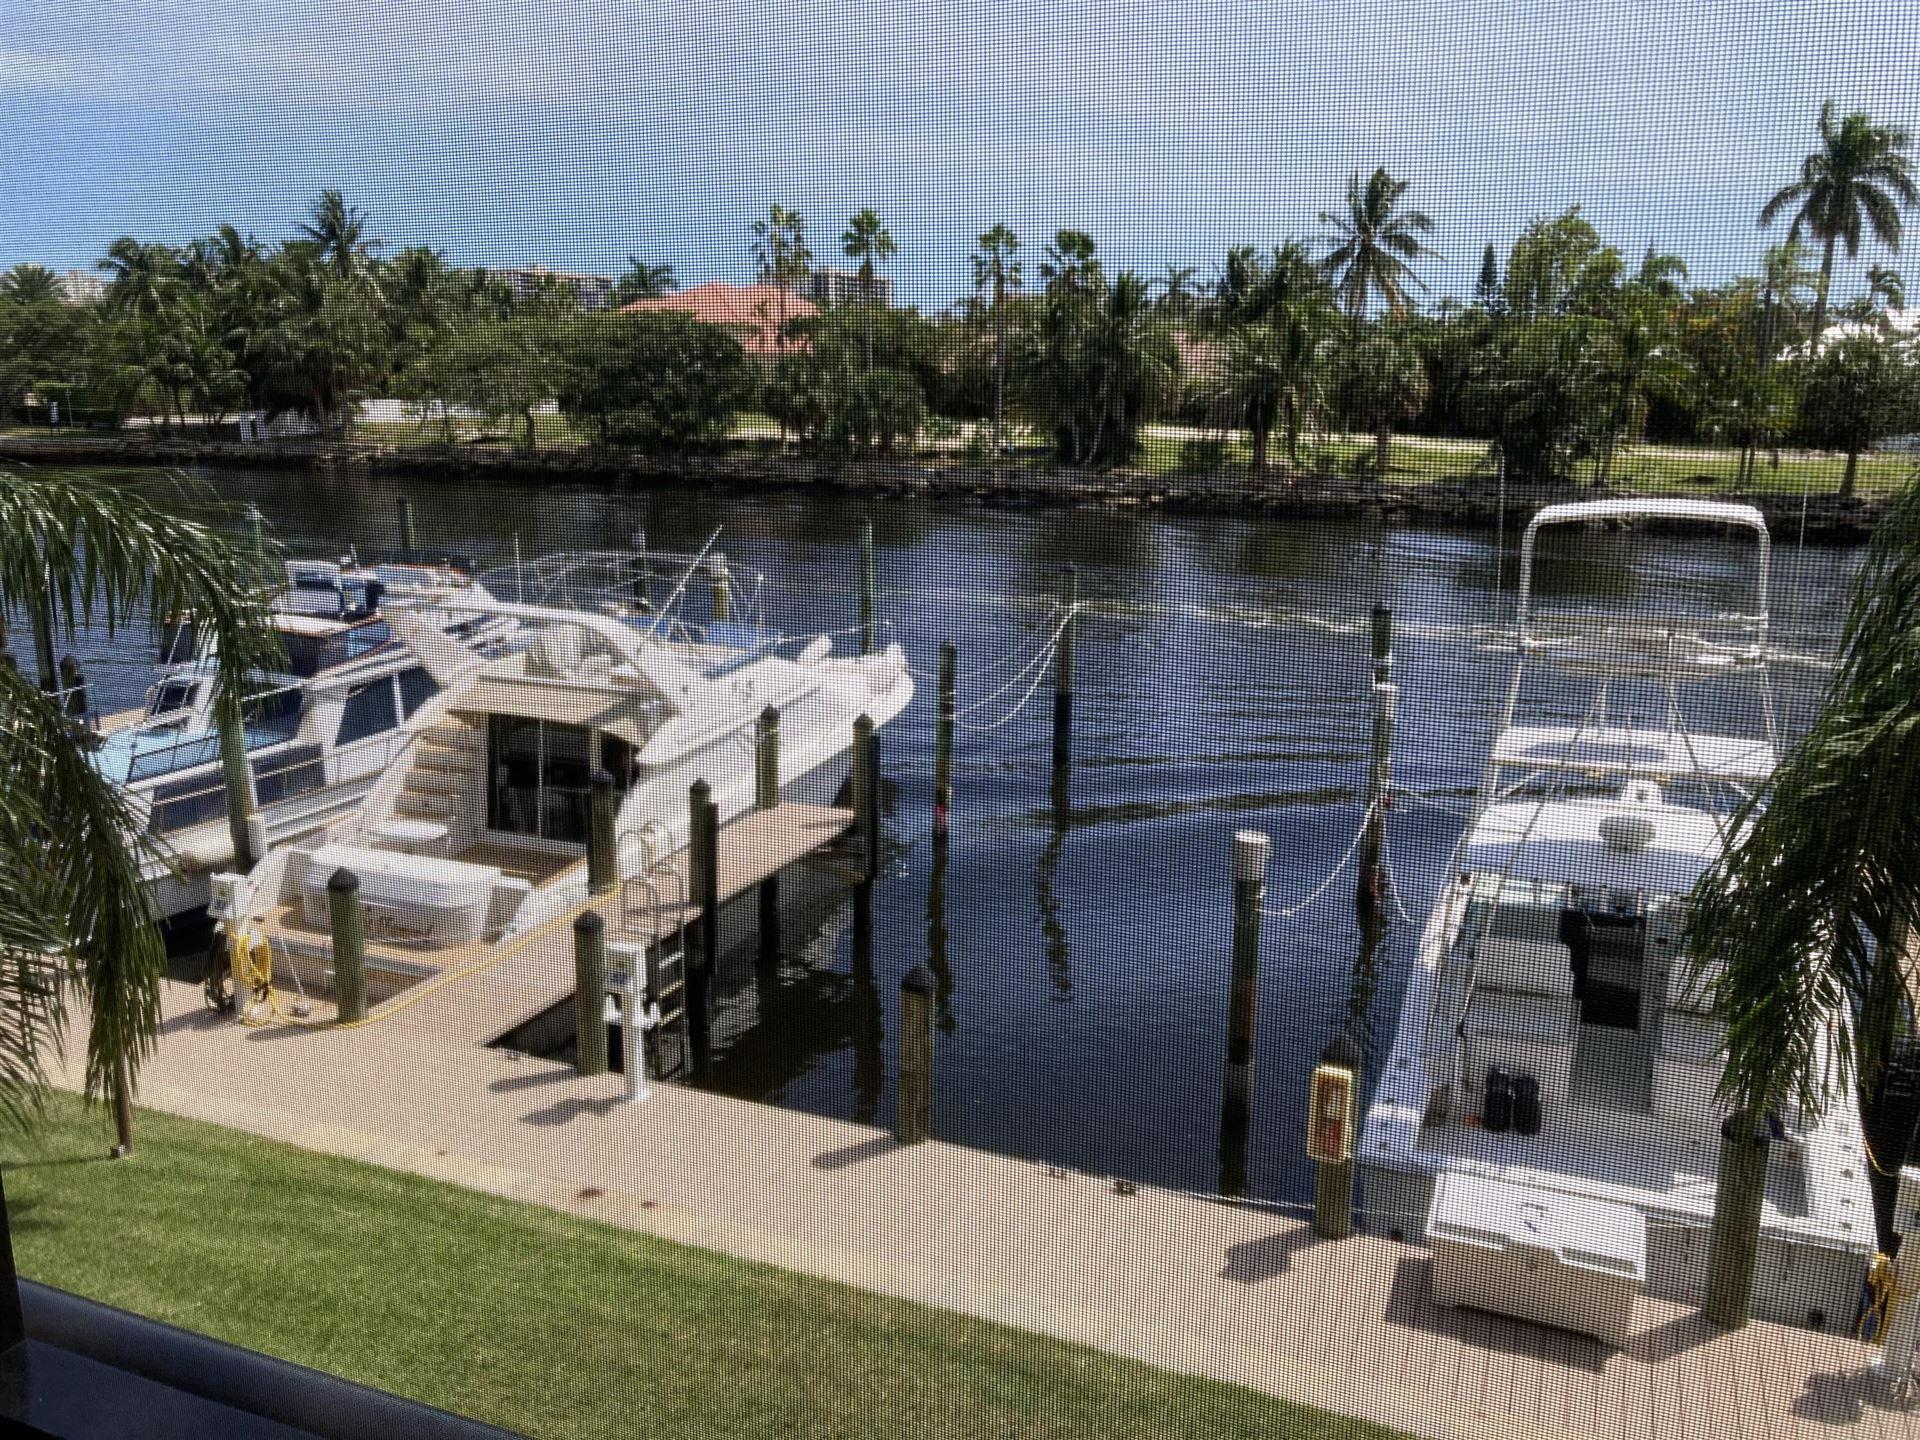 240 Captains Walk #515, Delray Beach, FL 33483 - MLS#: RX-10715186